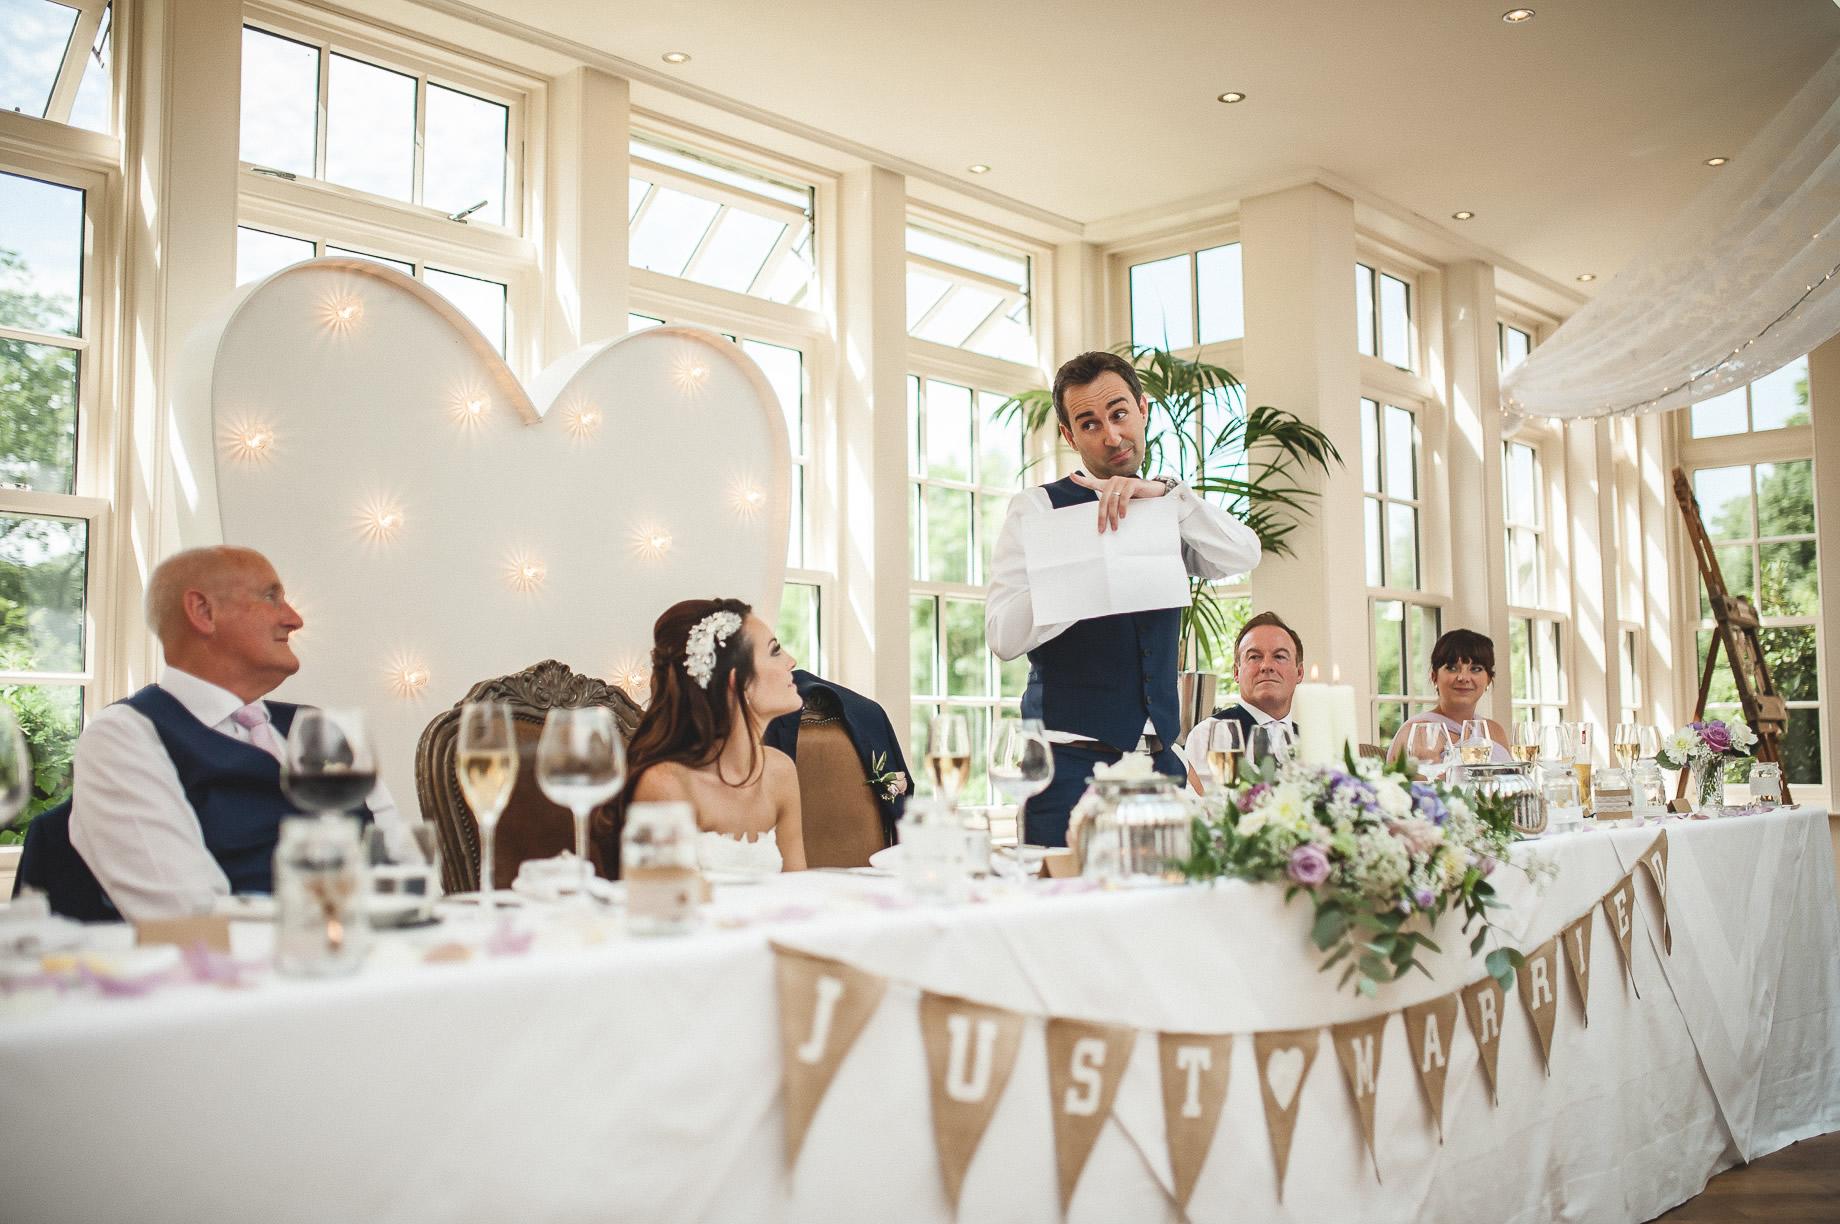 Helen and Matt's Wedding at Mitton Hall 086